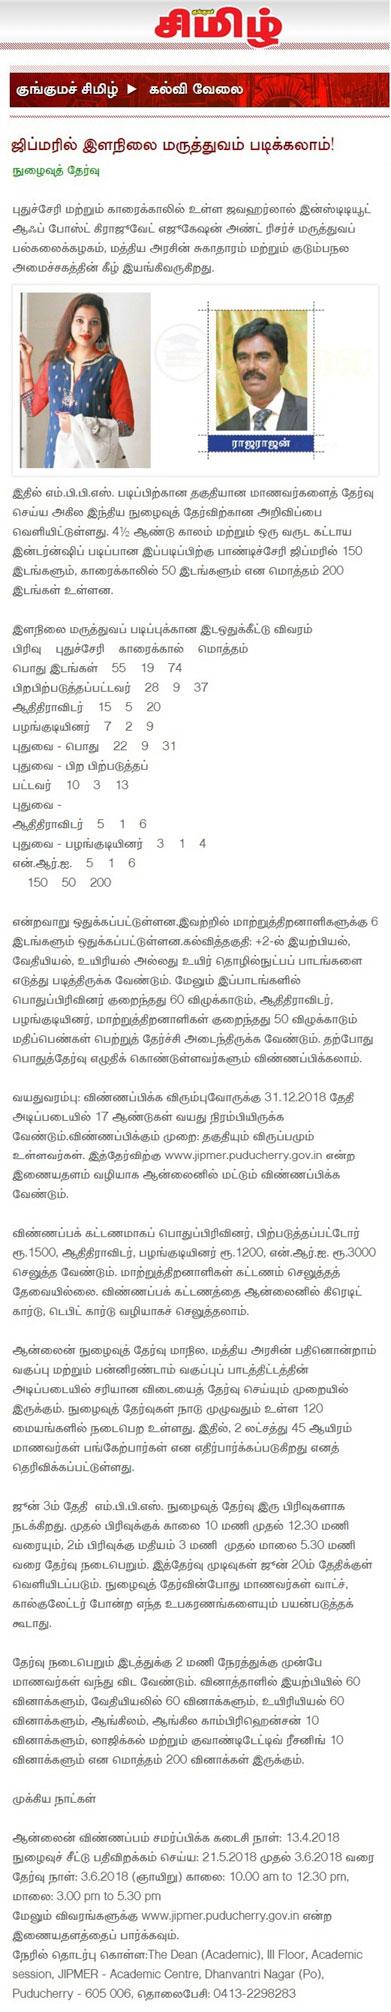 Ads by vnandhinimodelcoordinator